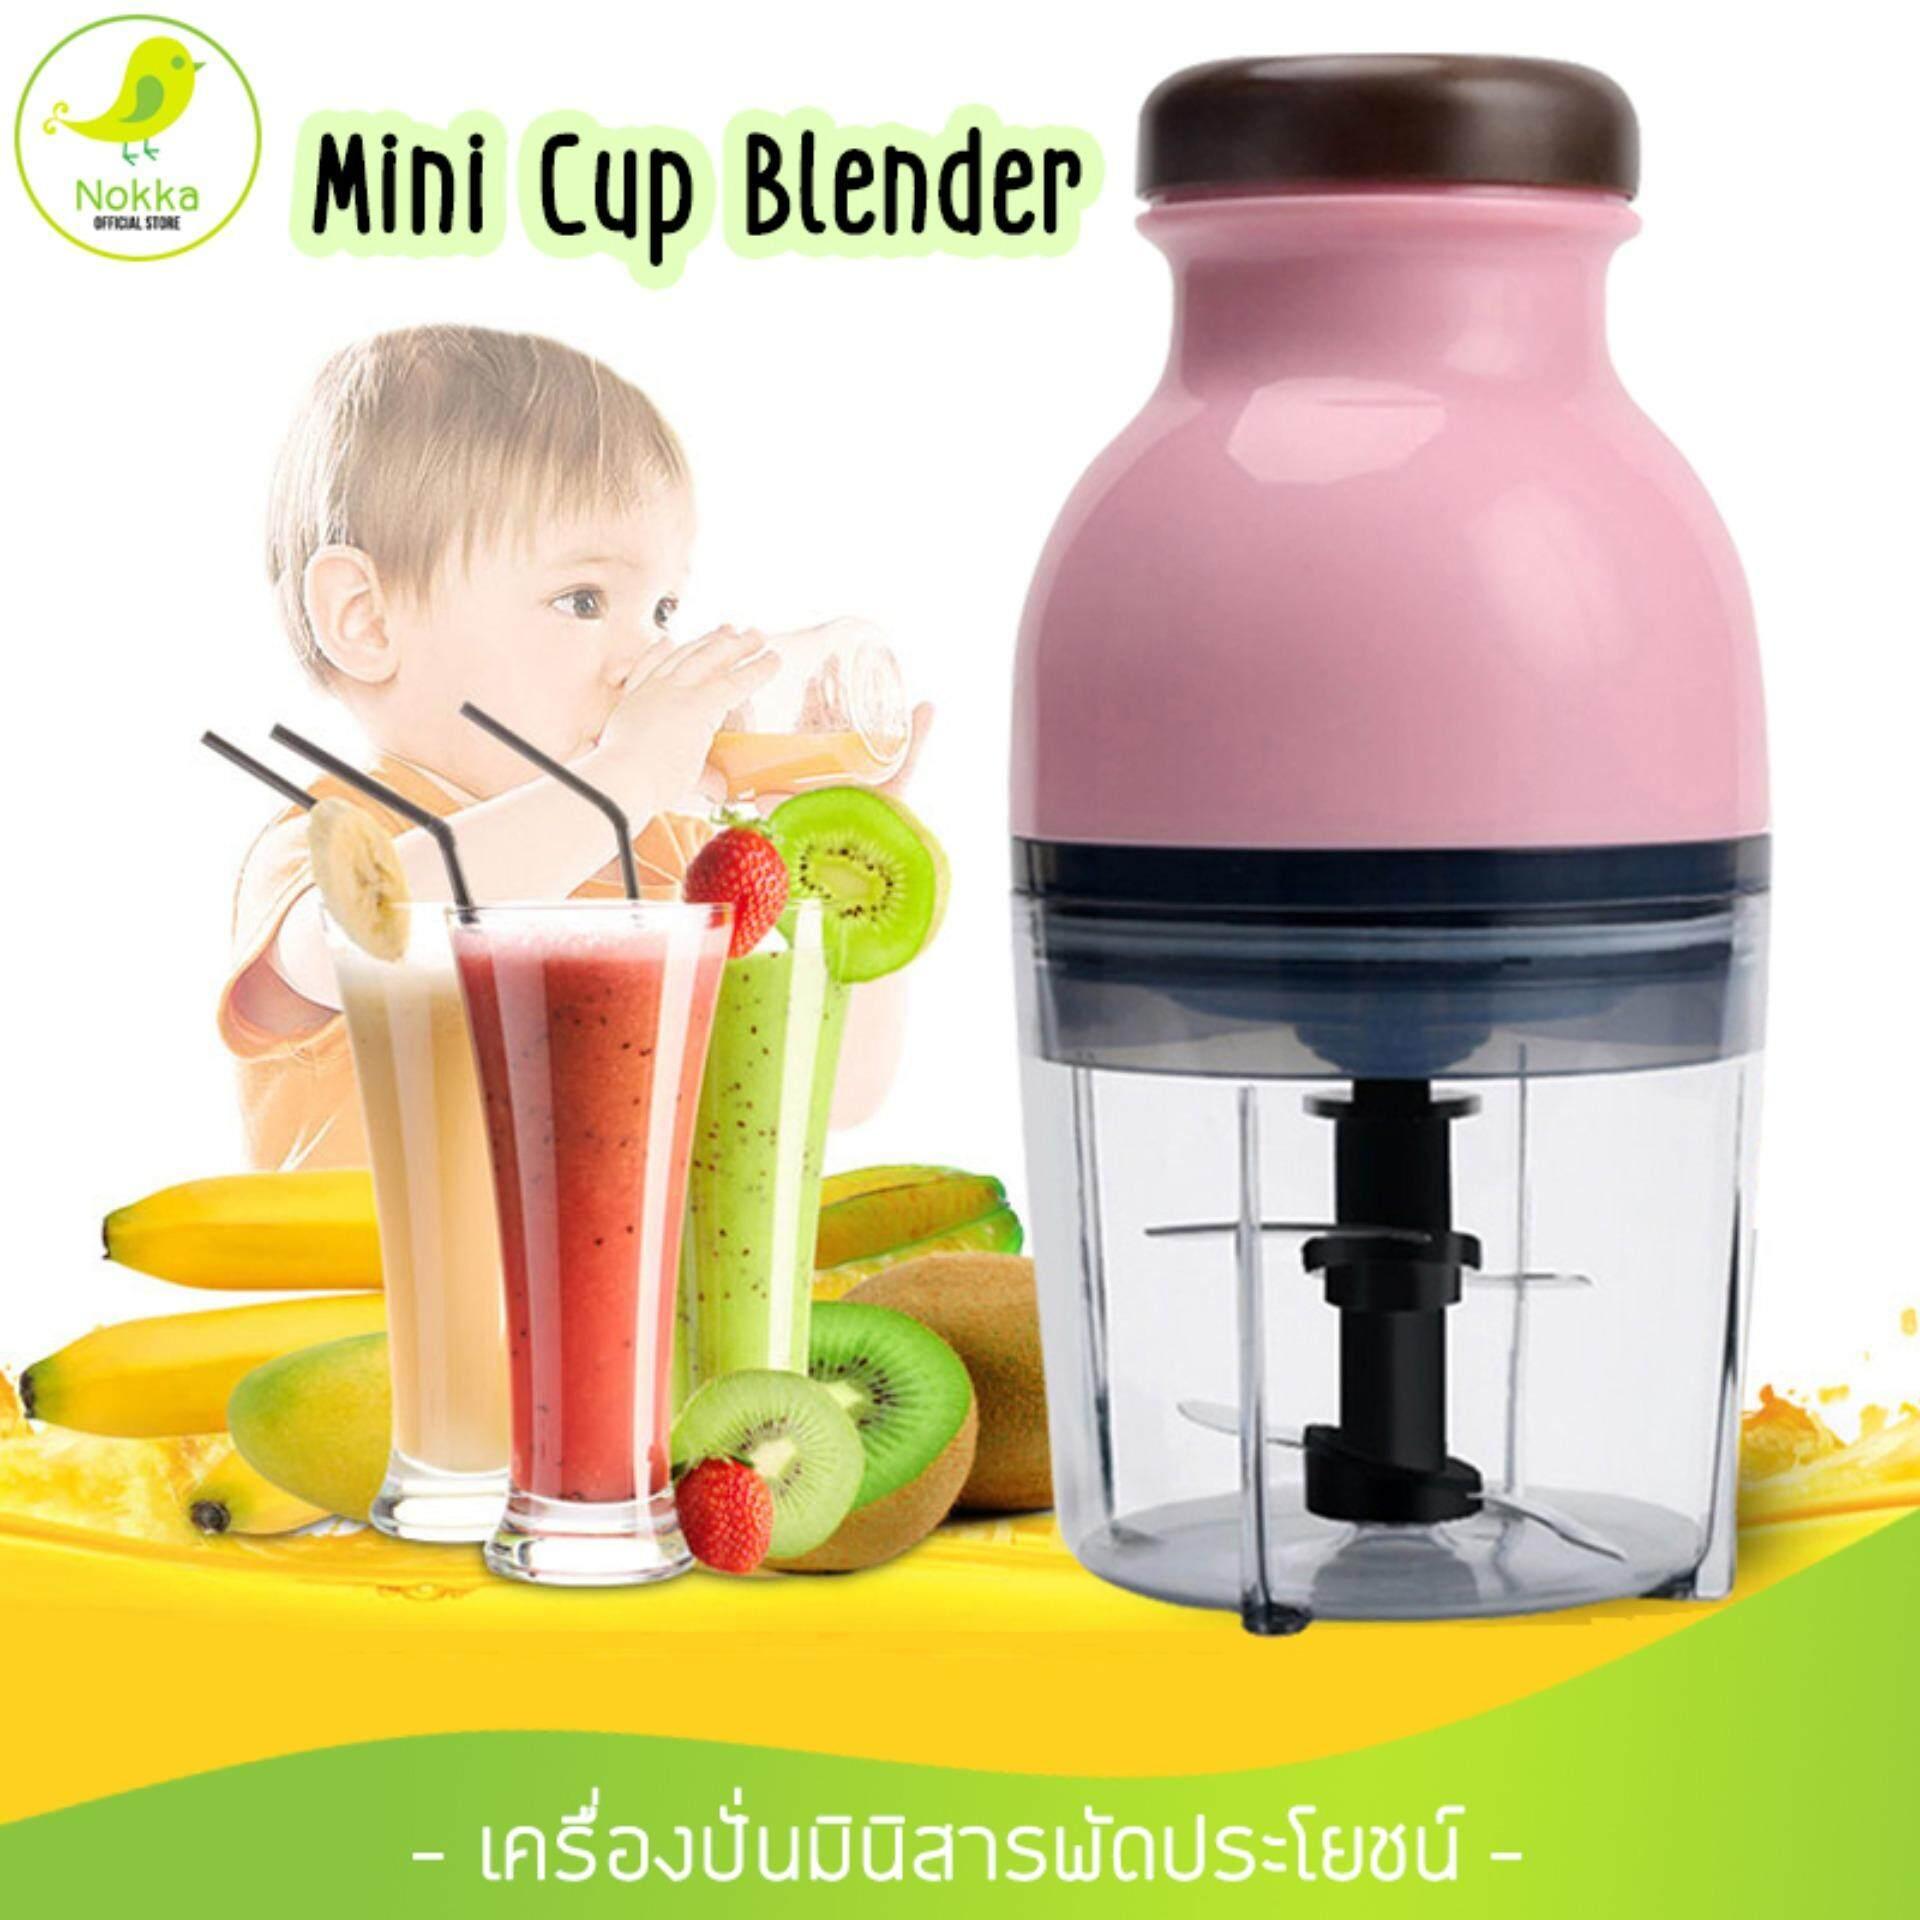 Mini Cup Blender เครื่องปั่นสารพัดประโยชน์ เครื่องปั่นอเนกประสงค์ nokka_shop